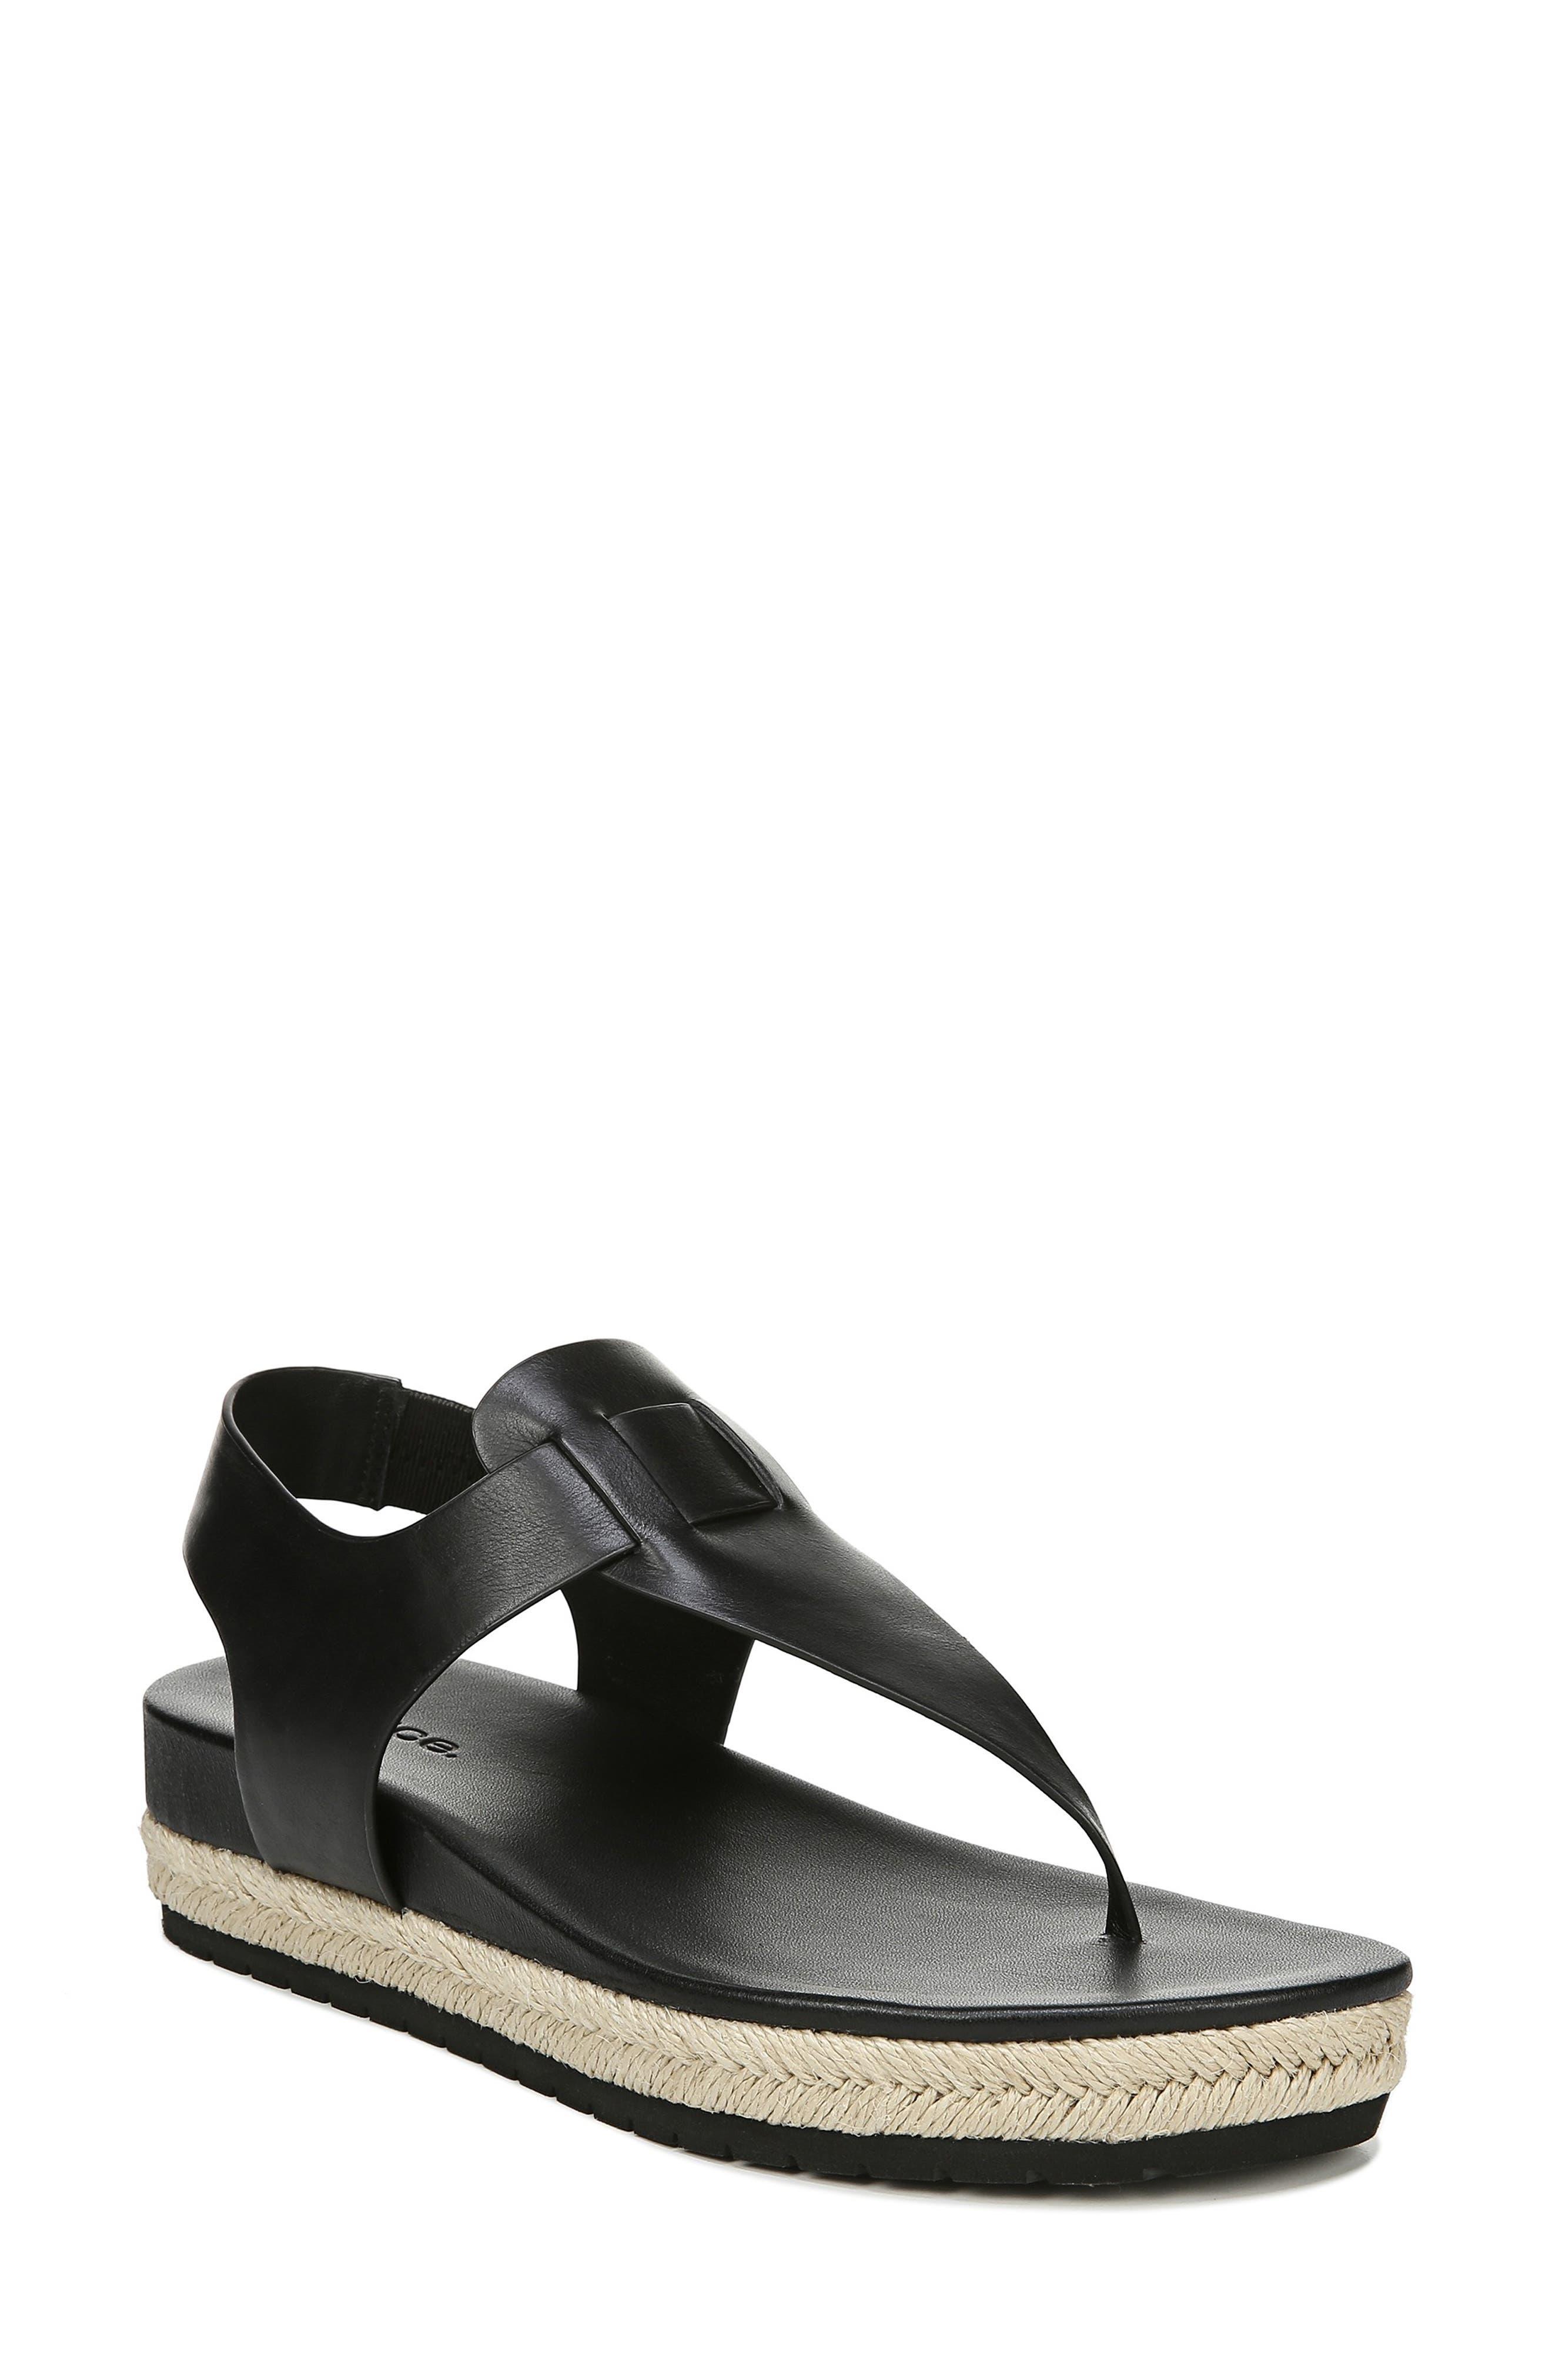 VINCE Flint Espadrille Thong Sandal, Main, color, BLACK